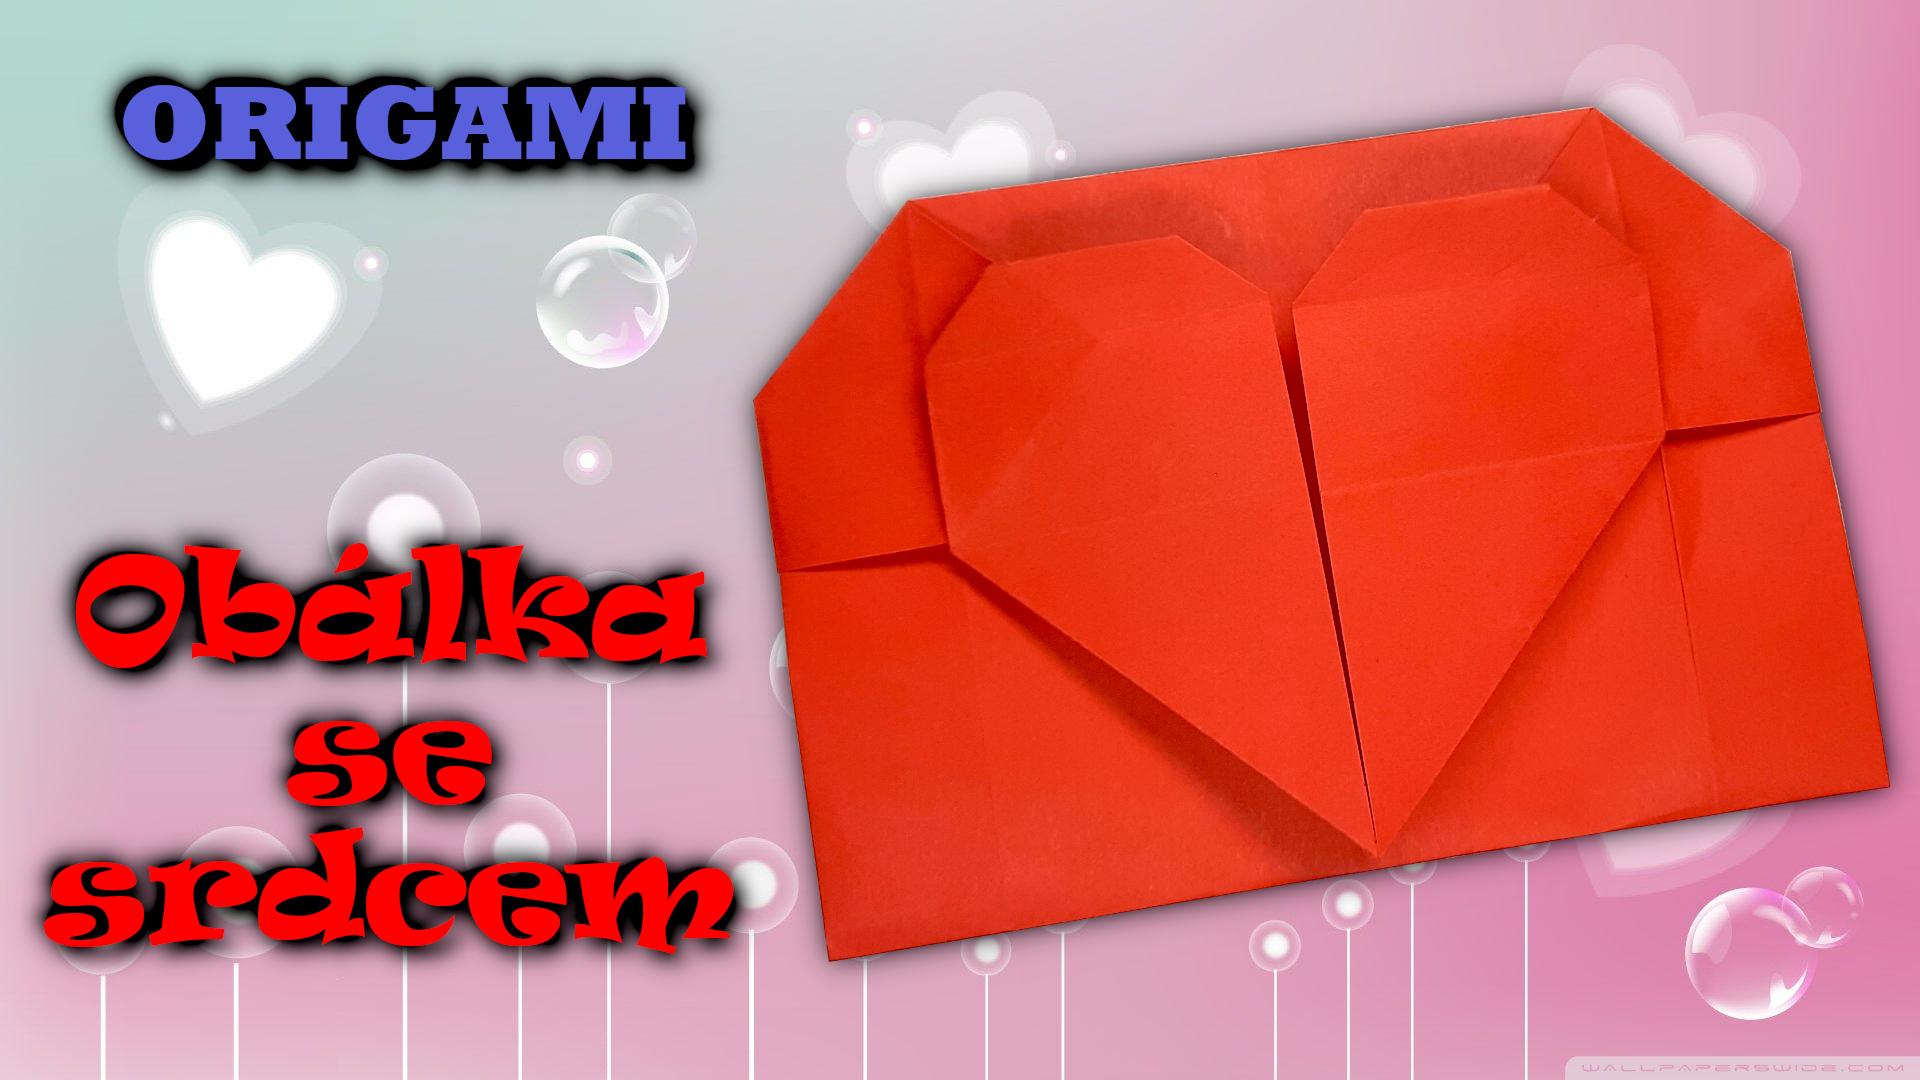 Origami obalka se srdcem k valentynovi - valentynske prani